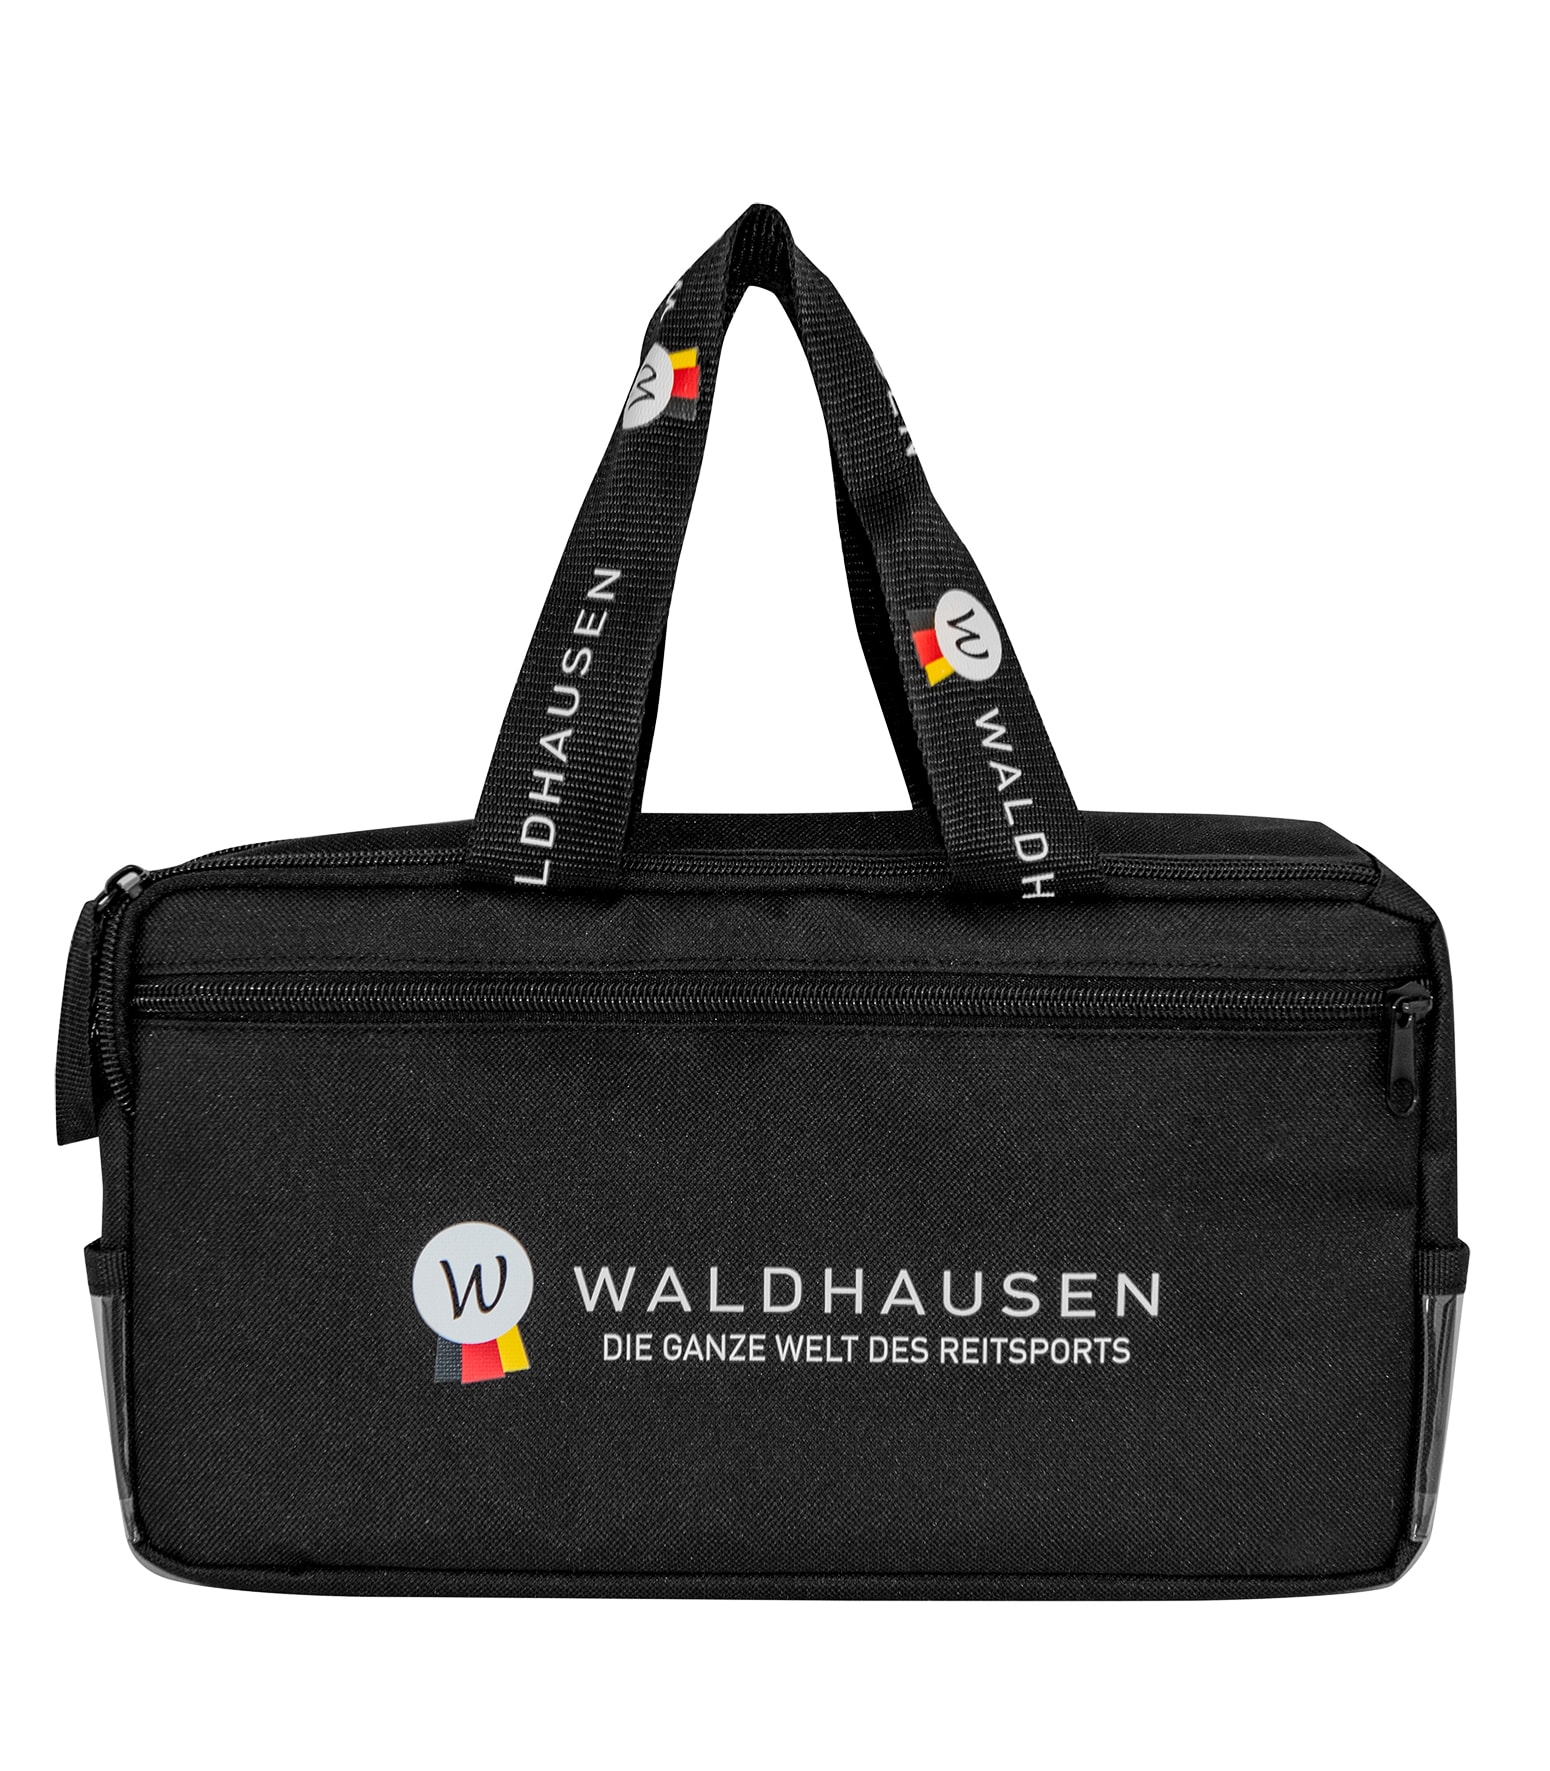 Waldhausen Health & Care kinnersuoja (kpl)